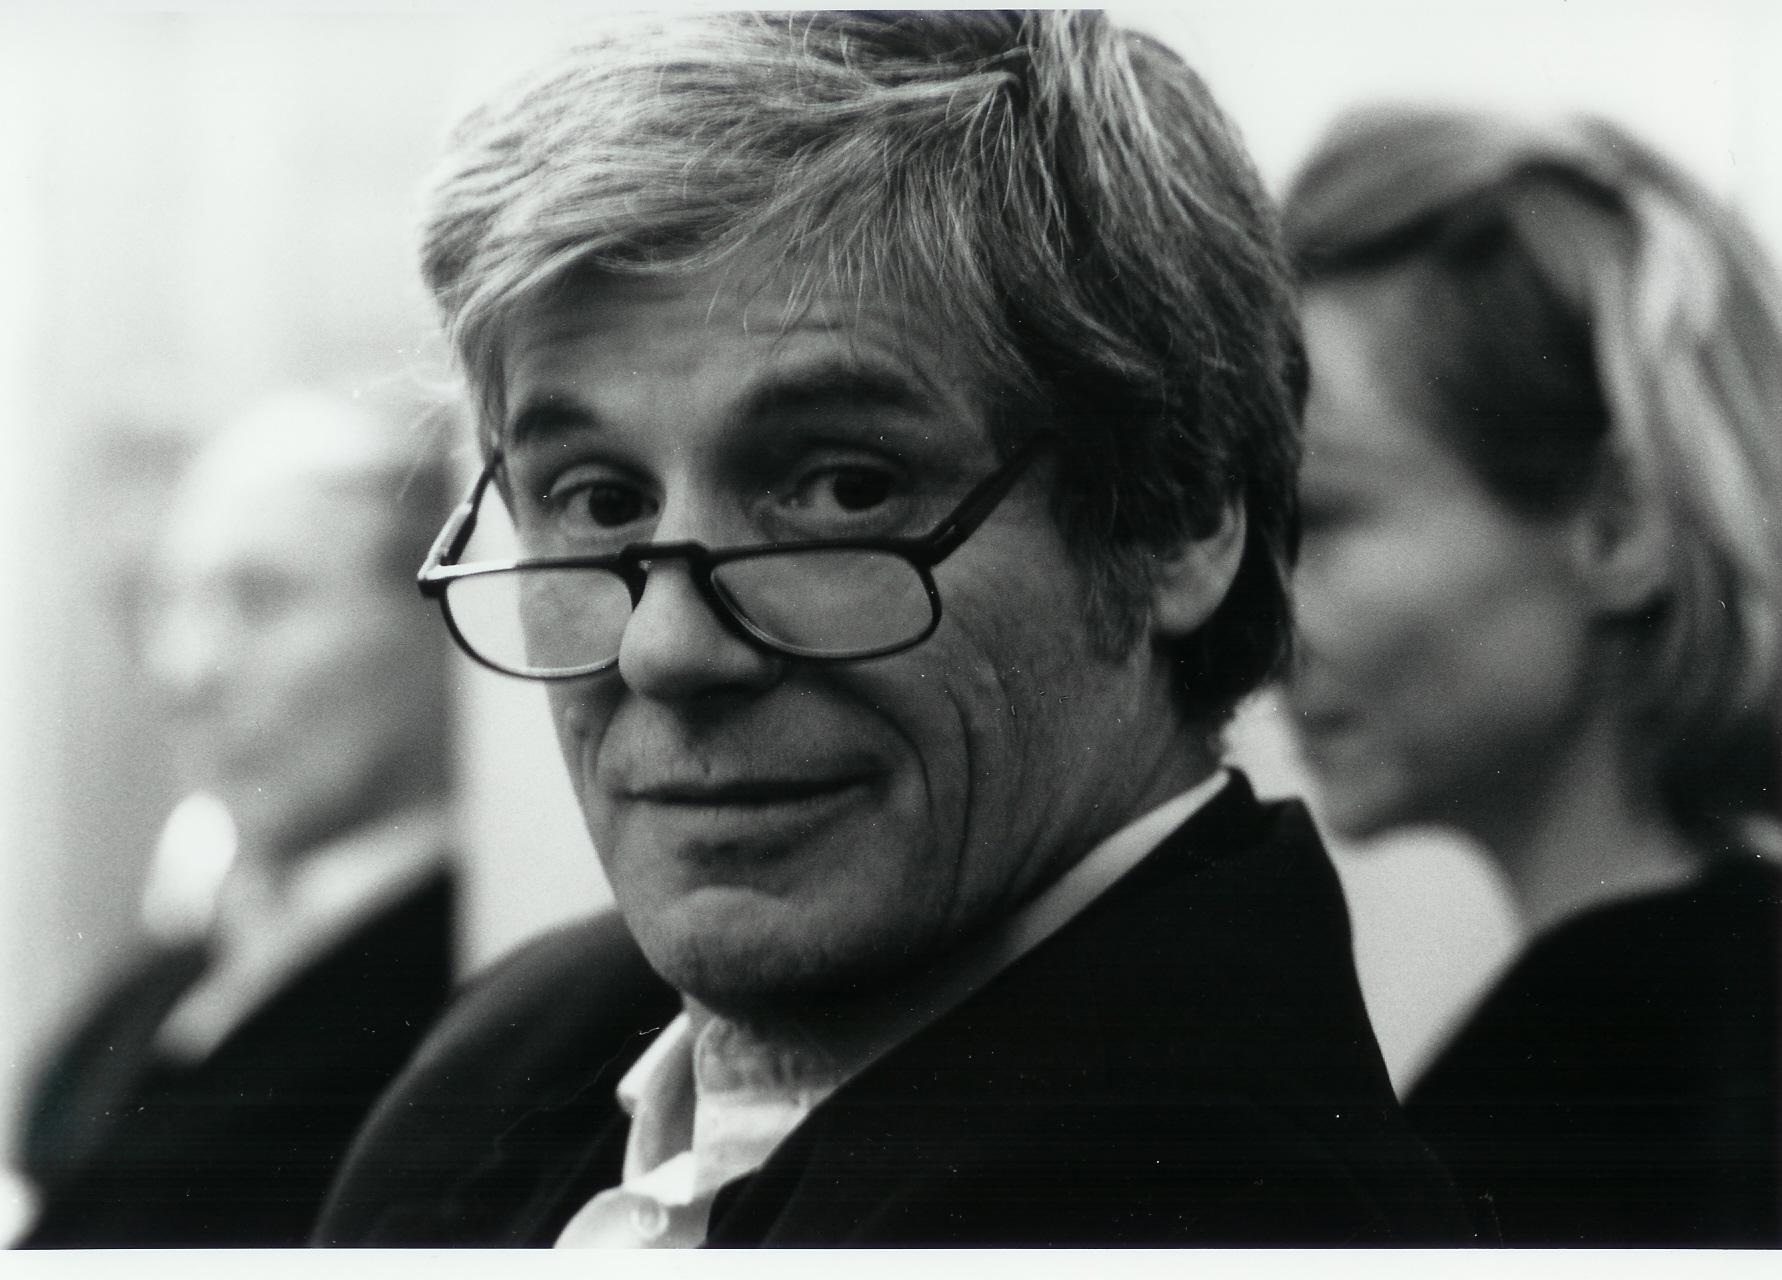 Jean-Claude Dauphin | hachette fr